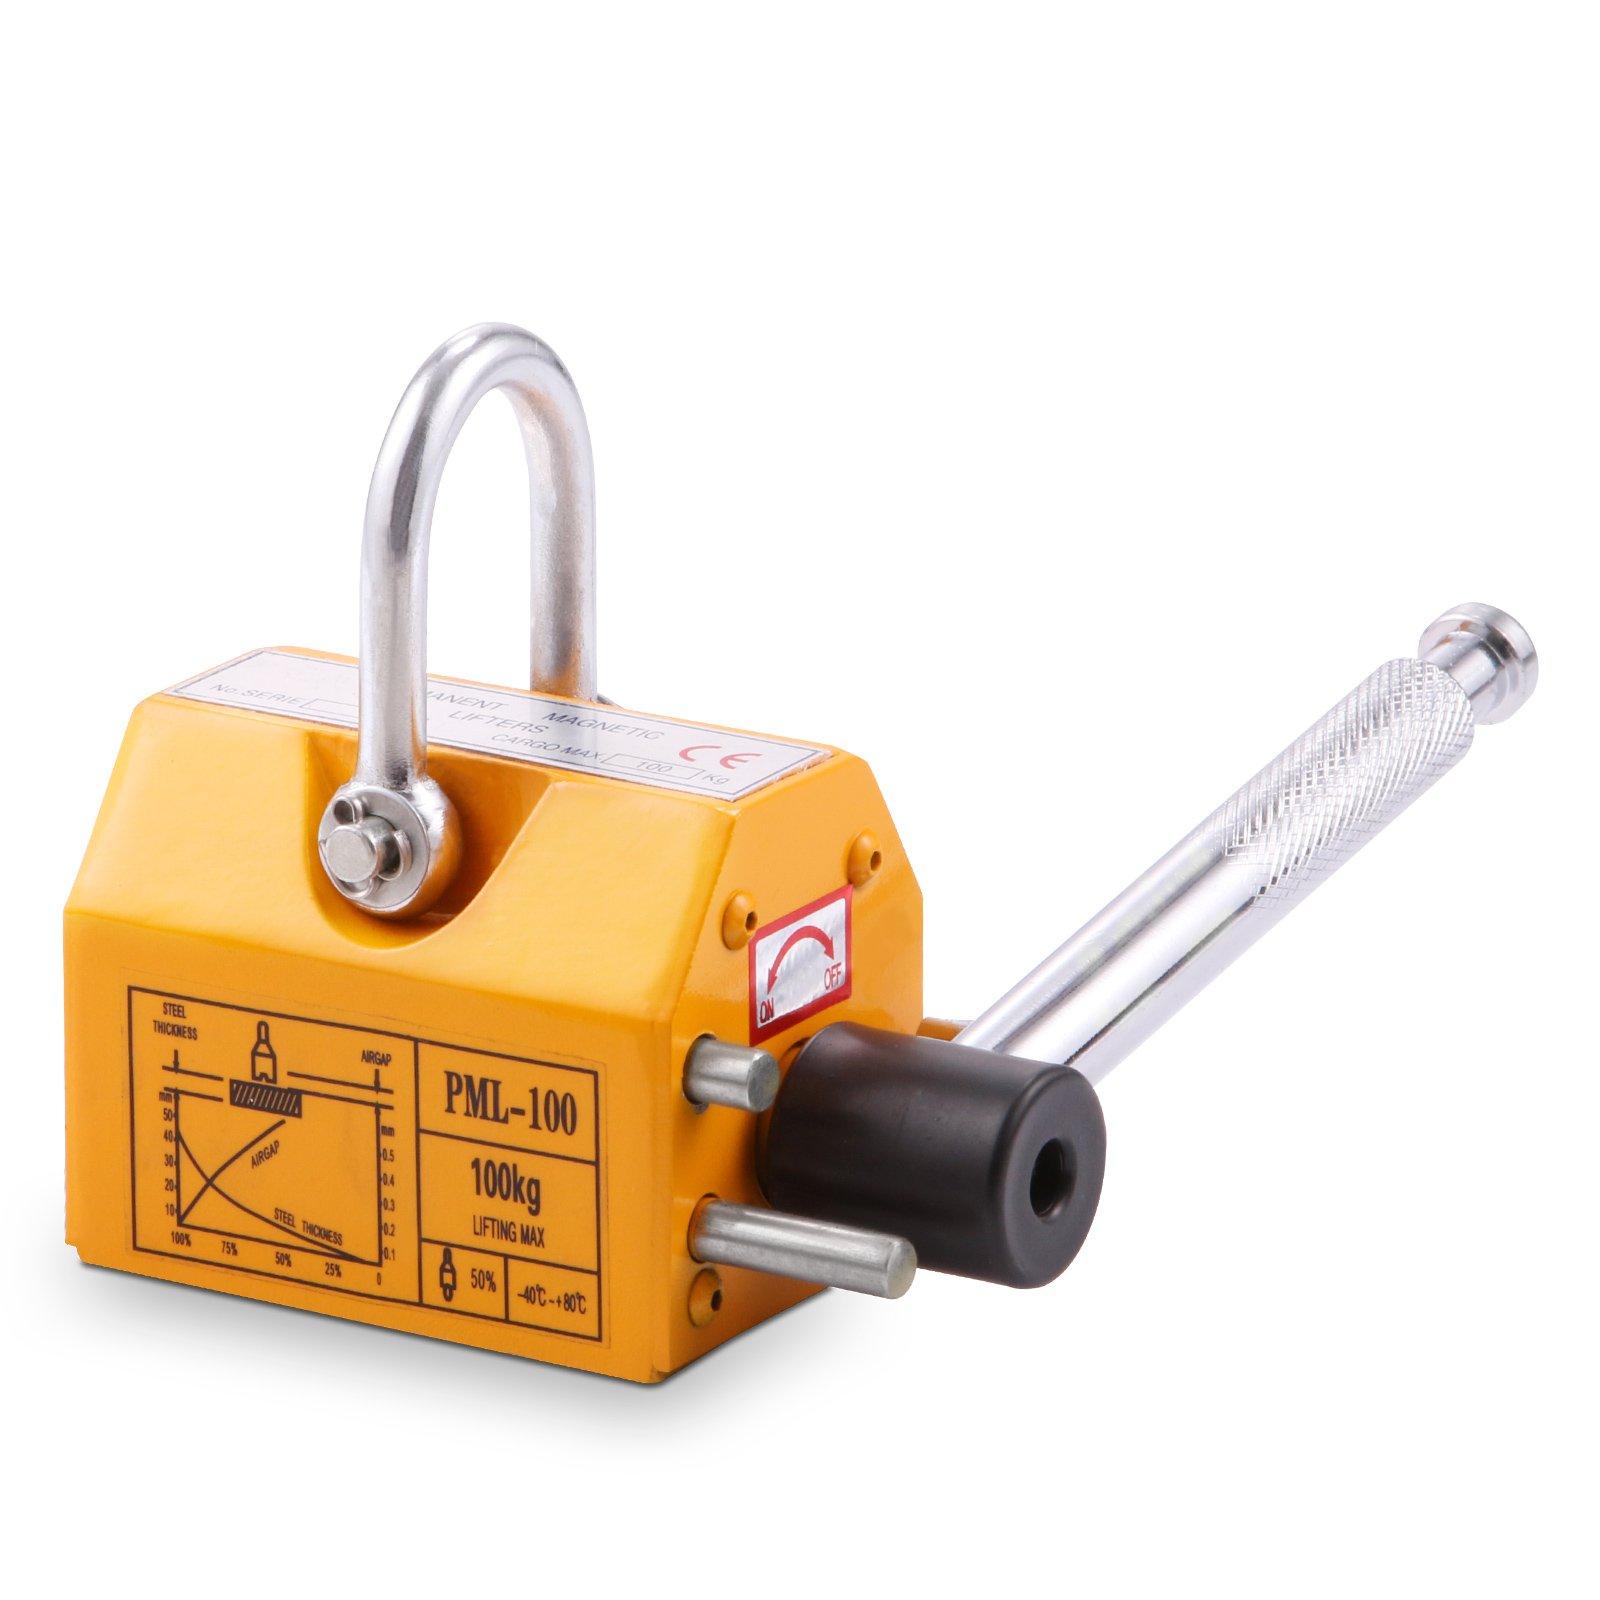 OrangeA 220LBS 100KG Steel Magnet Lifter Neodymium Magnetic Lifting Magnet Magnetic Shop Crane Metal Lifting Hoist (220LBS)